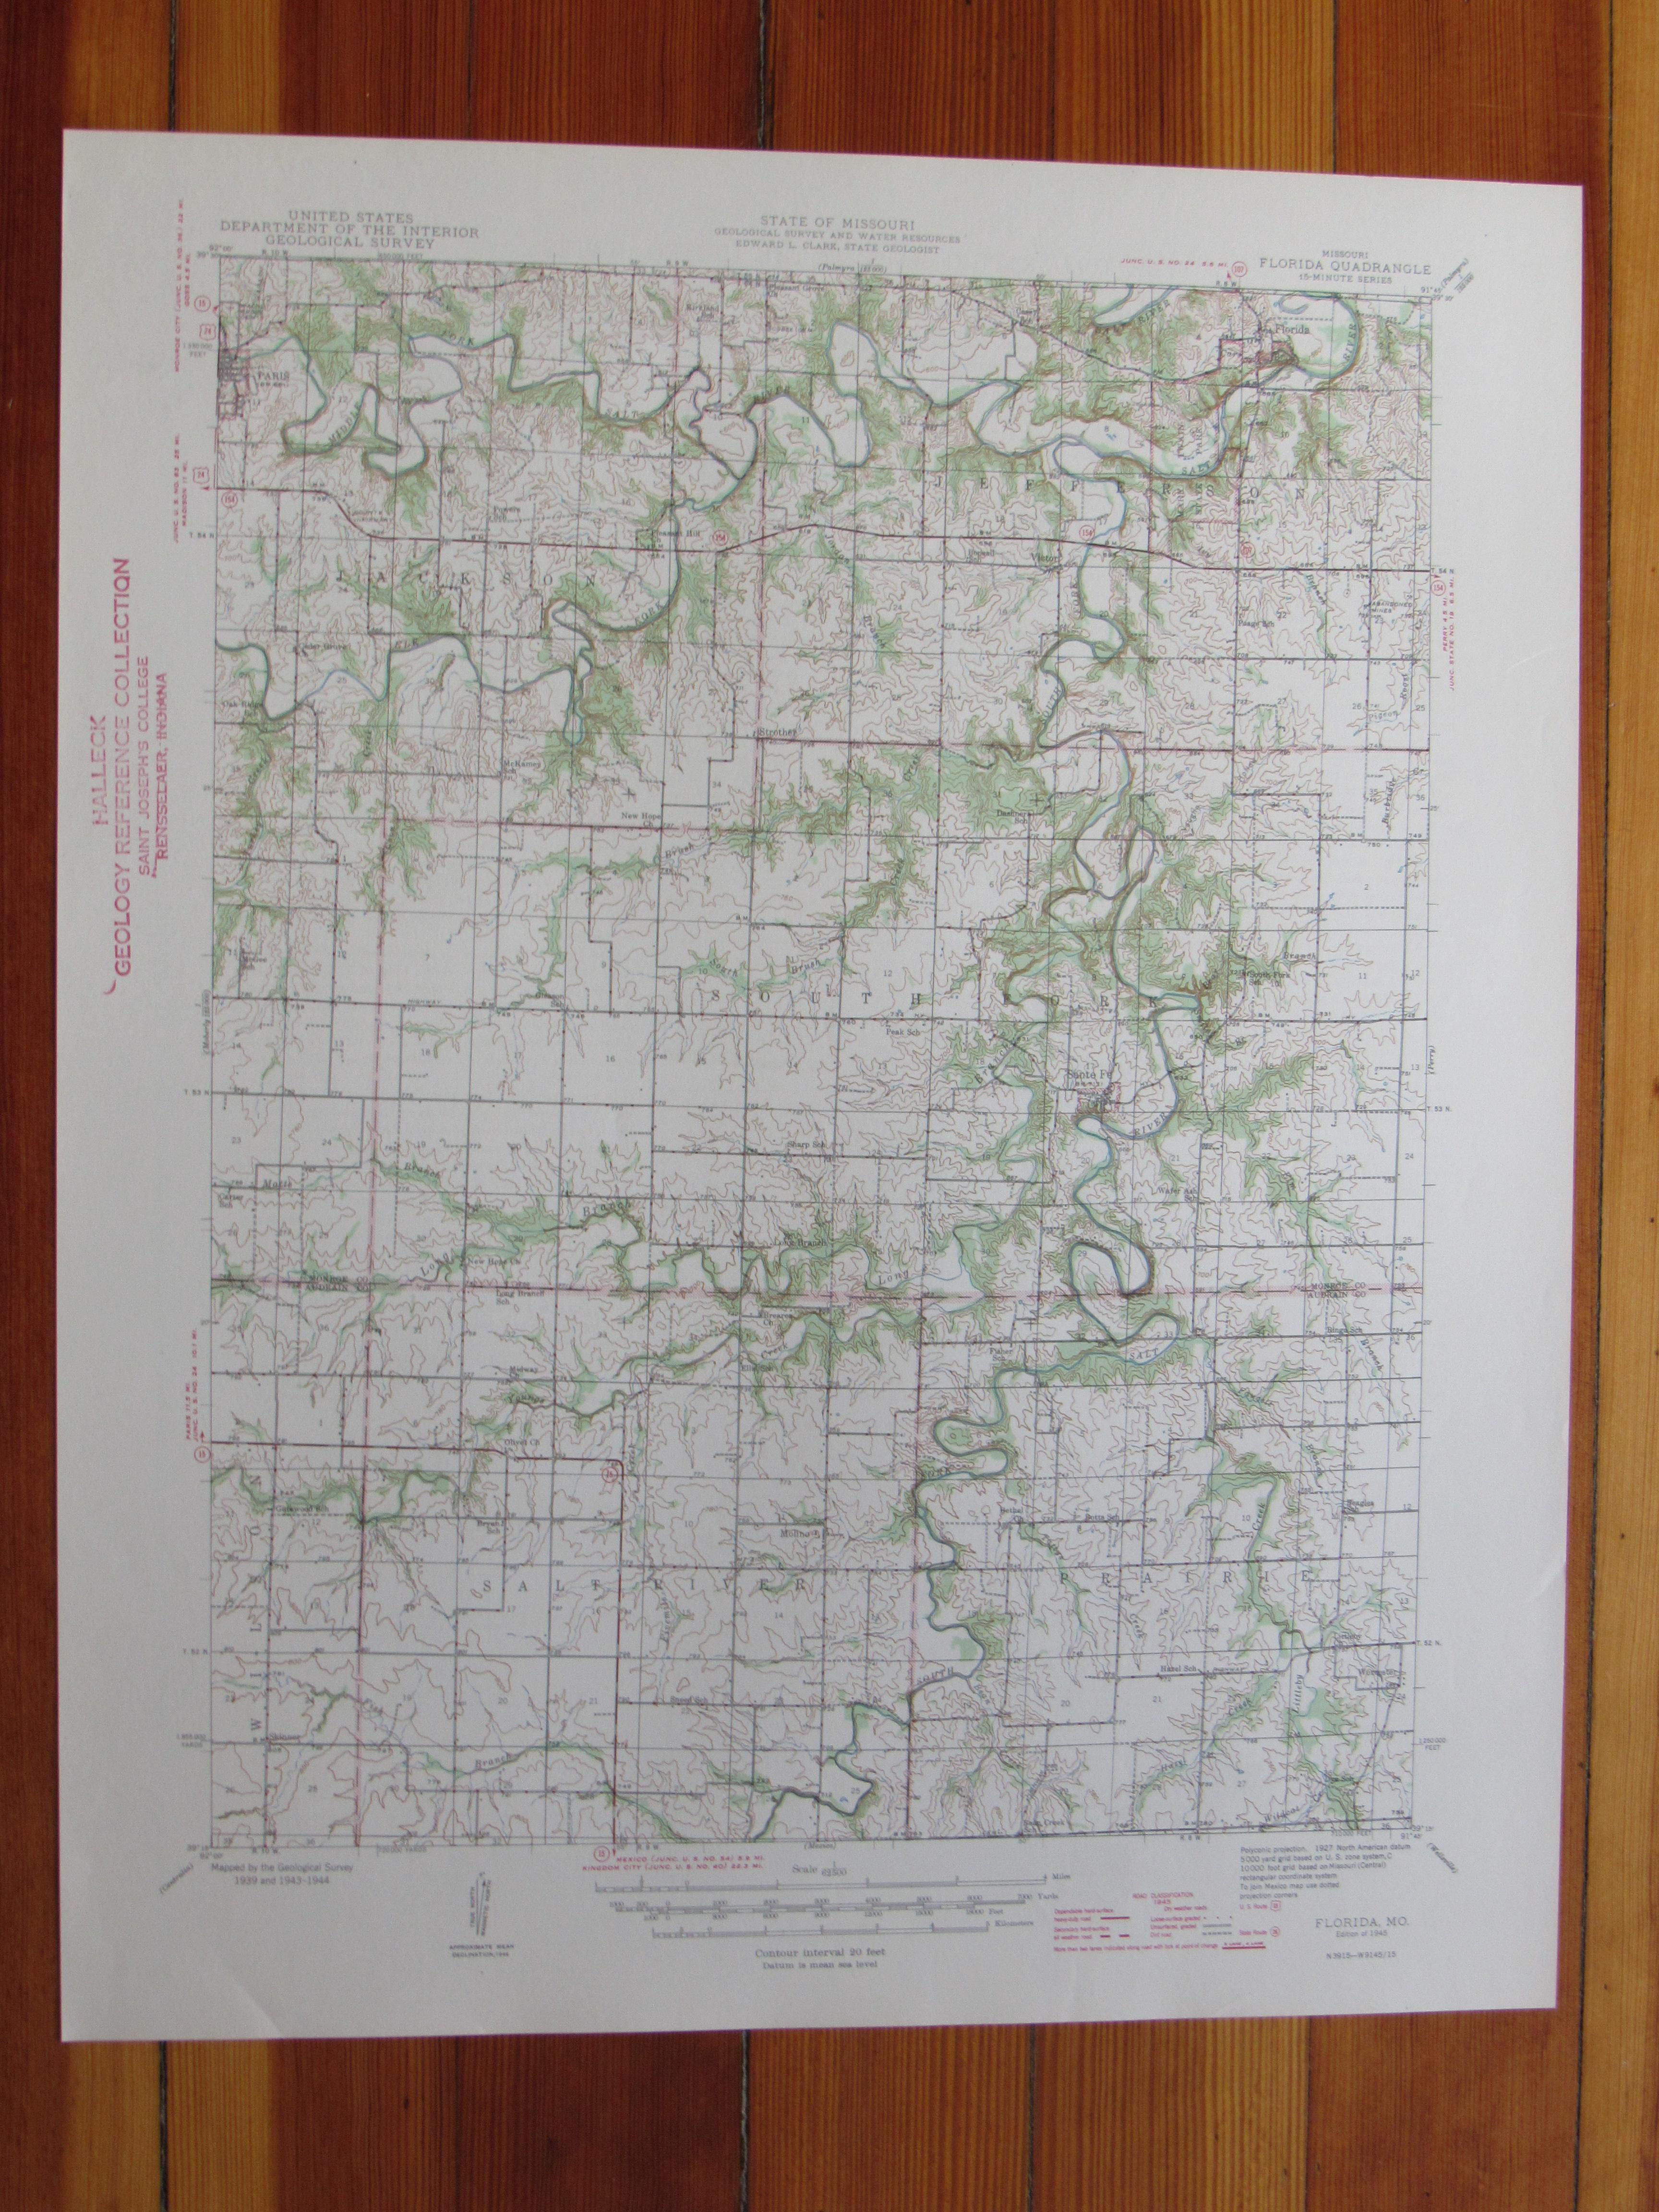 Florida Missouri 1945 Original Vintage USGS Topo Map   eBay